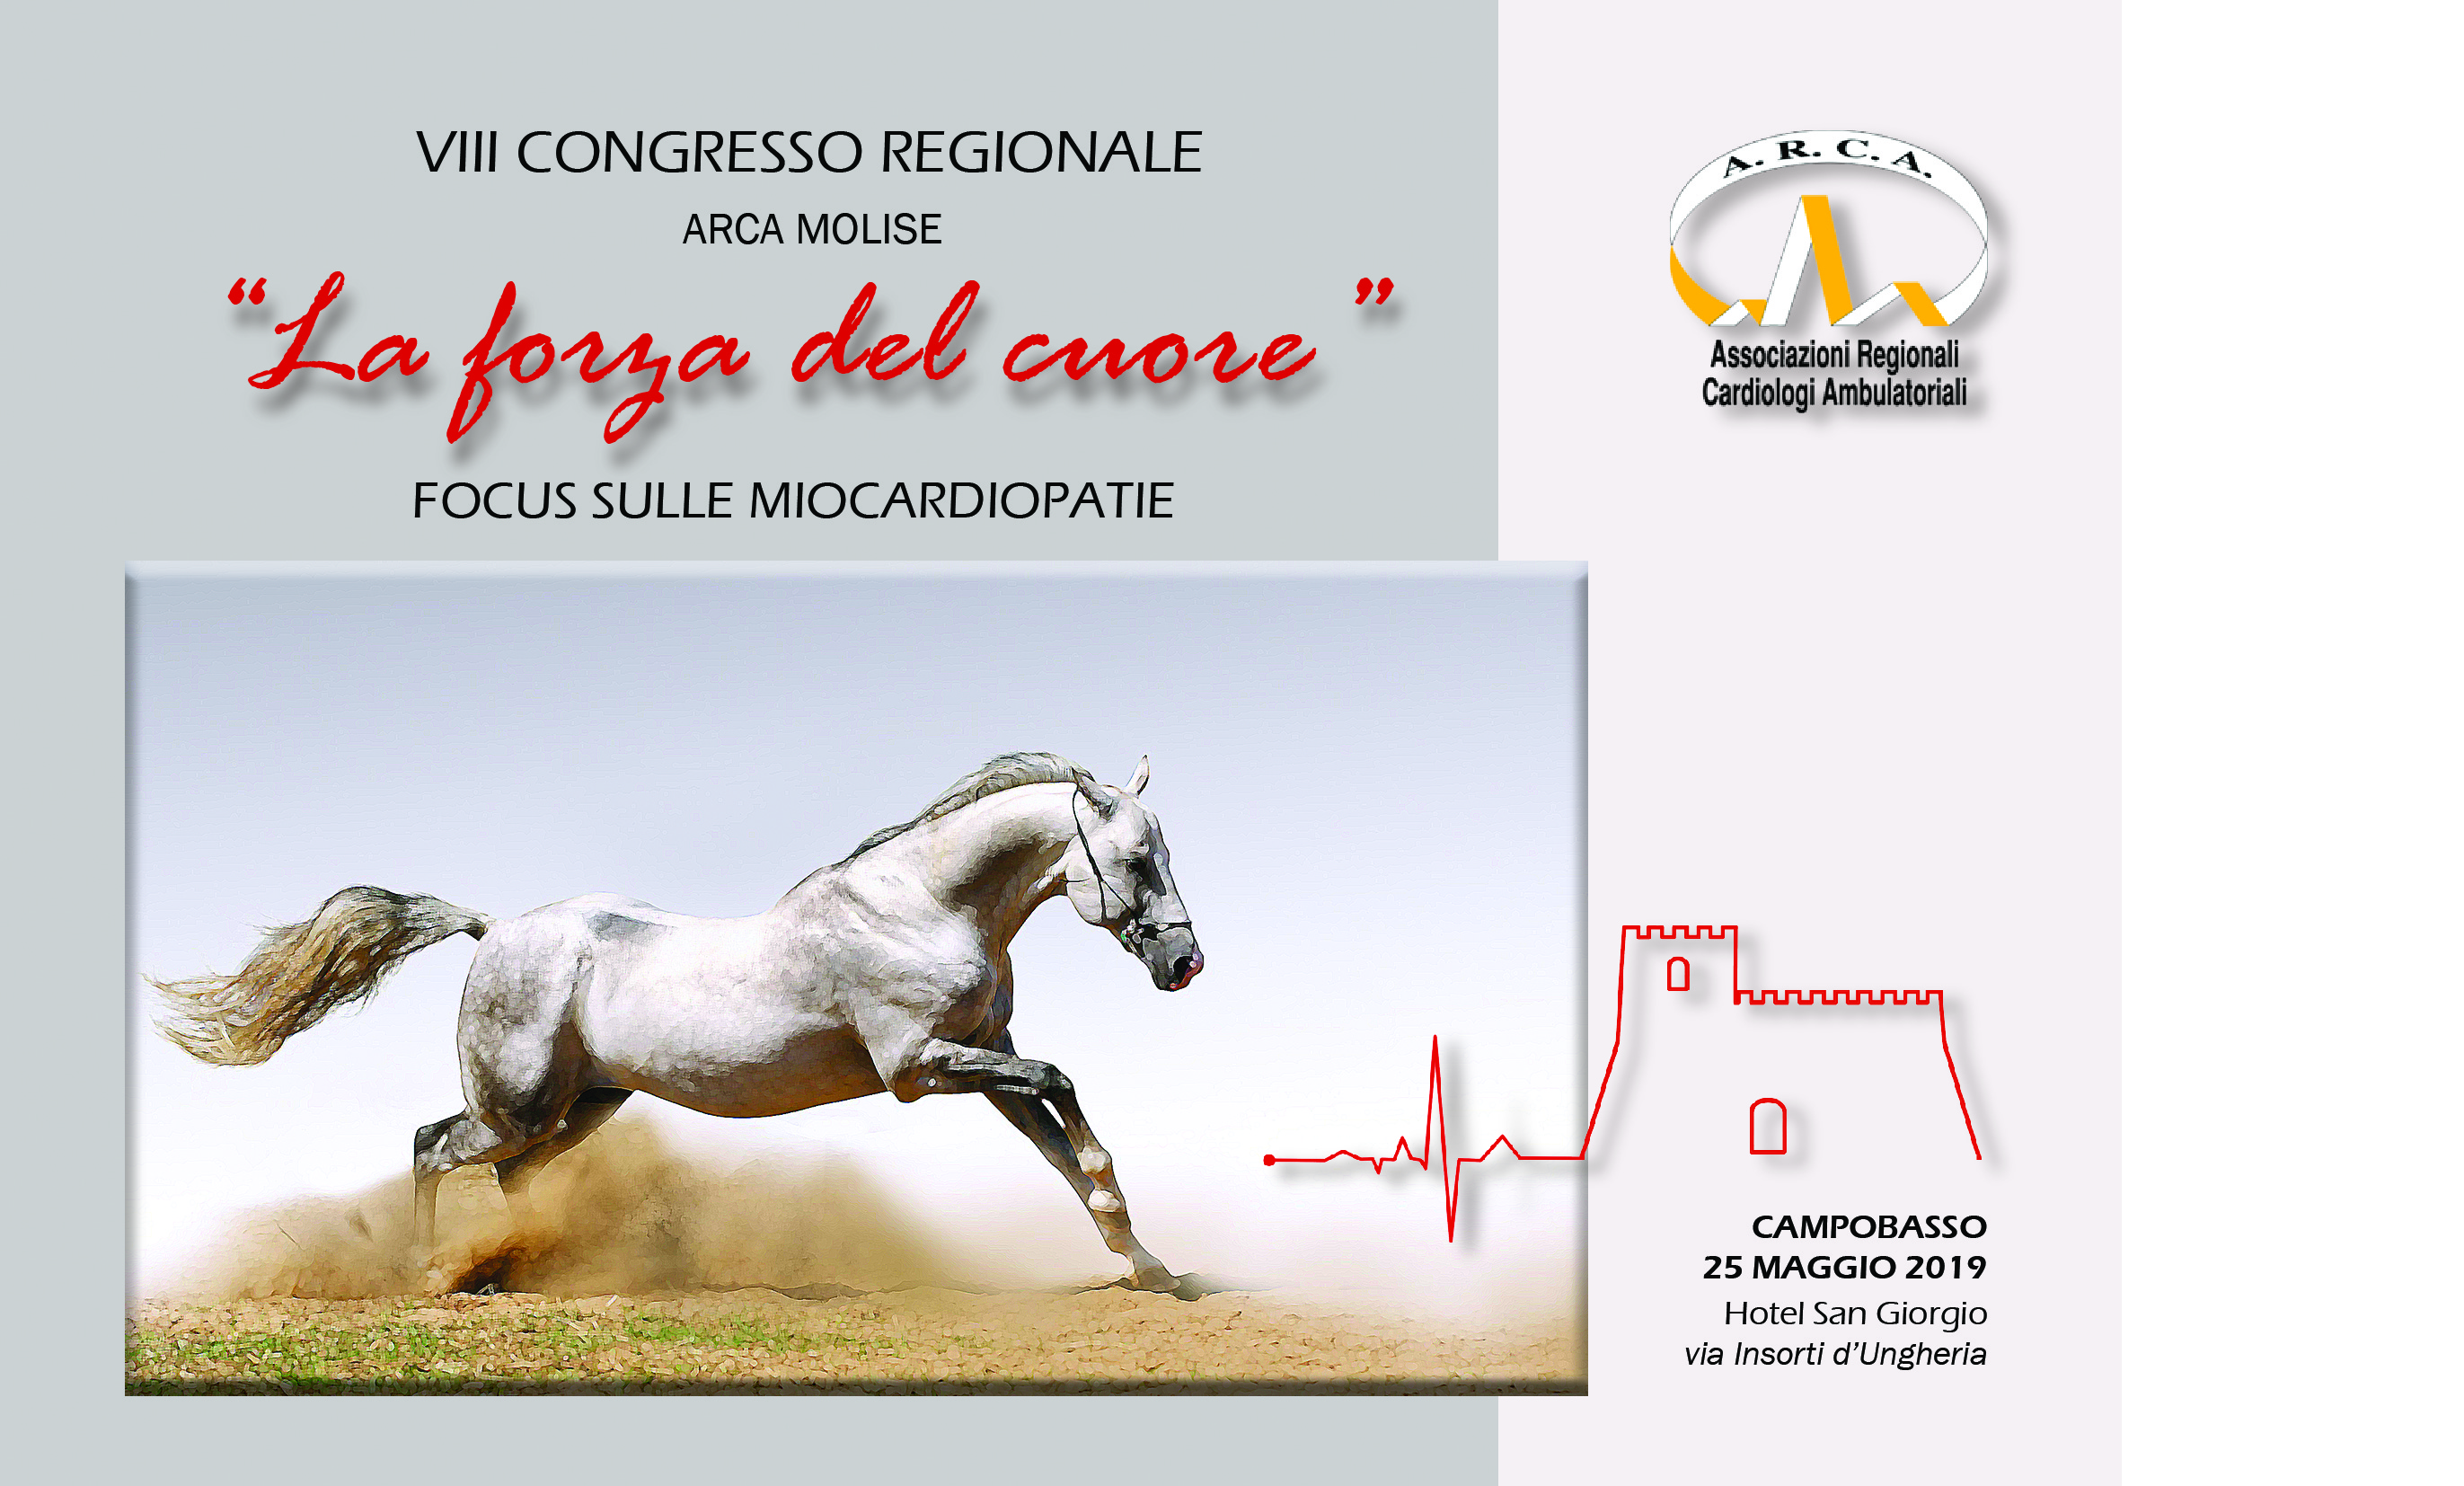 VIII CONGRESSO REGIONALE ARCA MOLISE. LA FORZA DEL CUORE. FOCUS SULLE MIOCARDIOPATIE